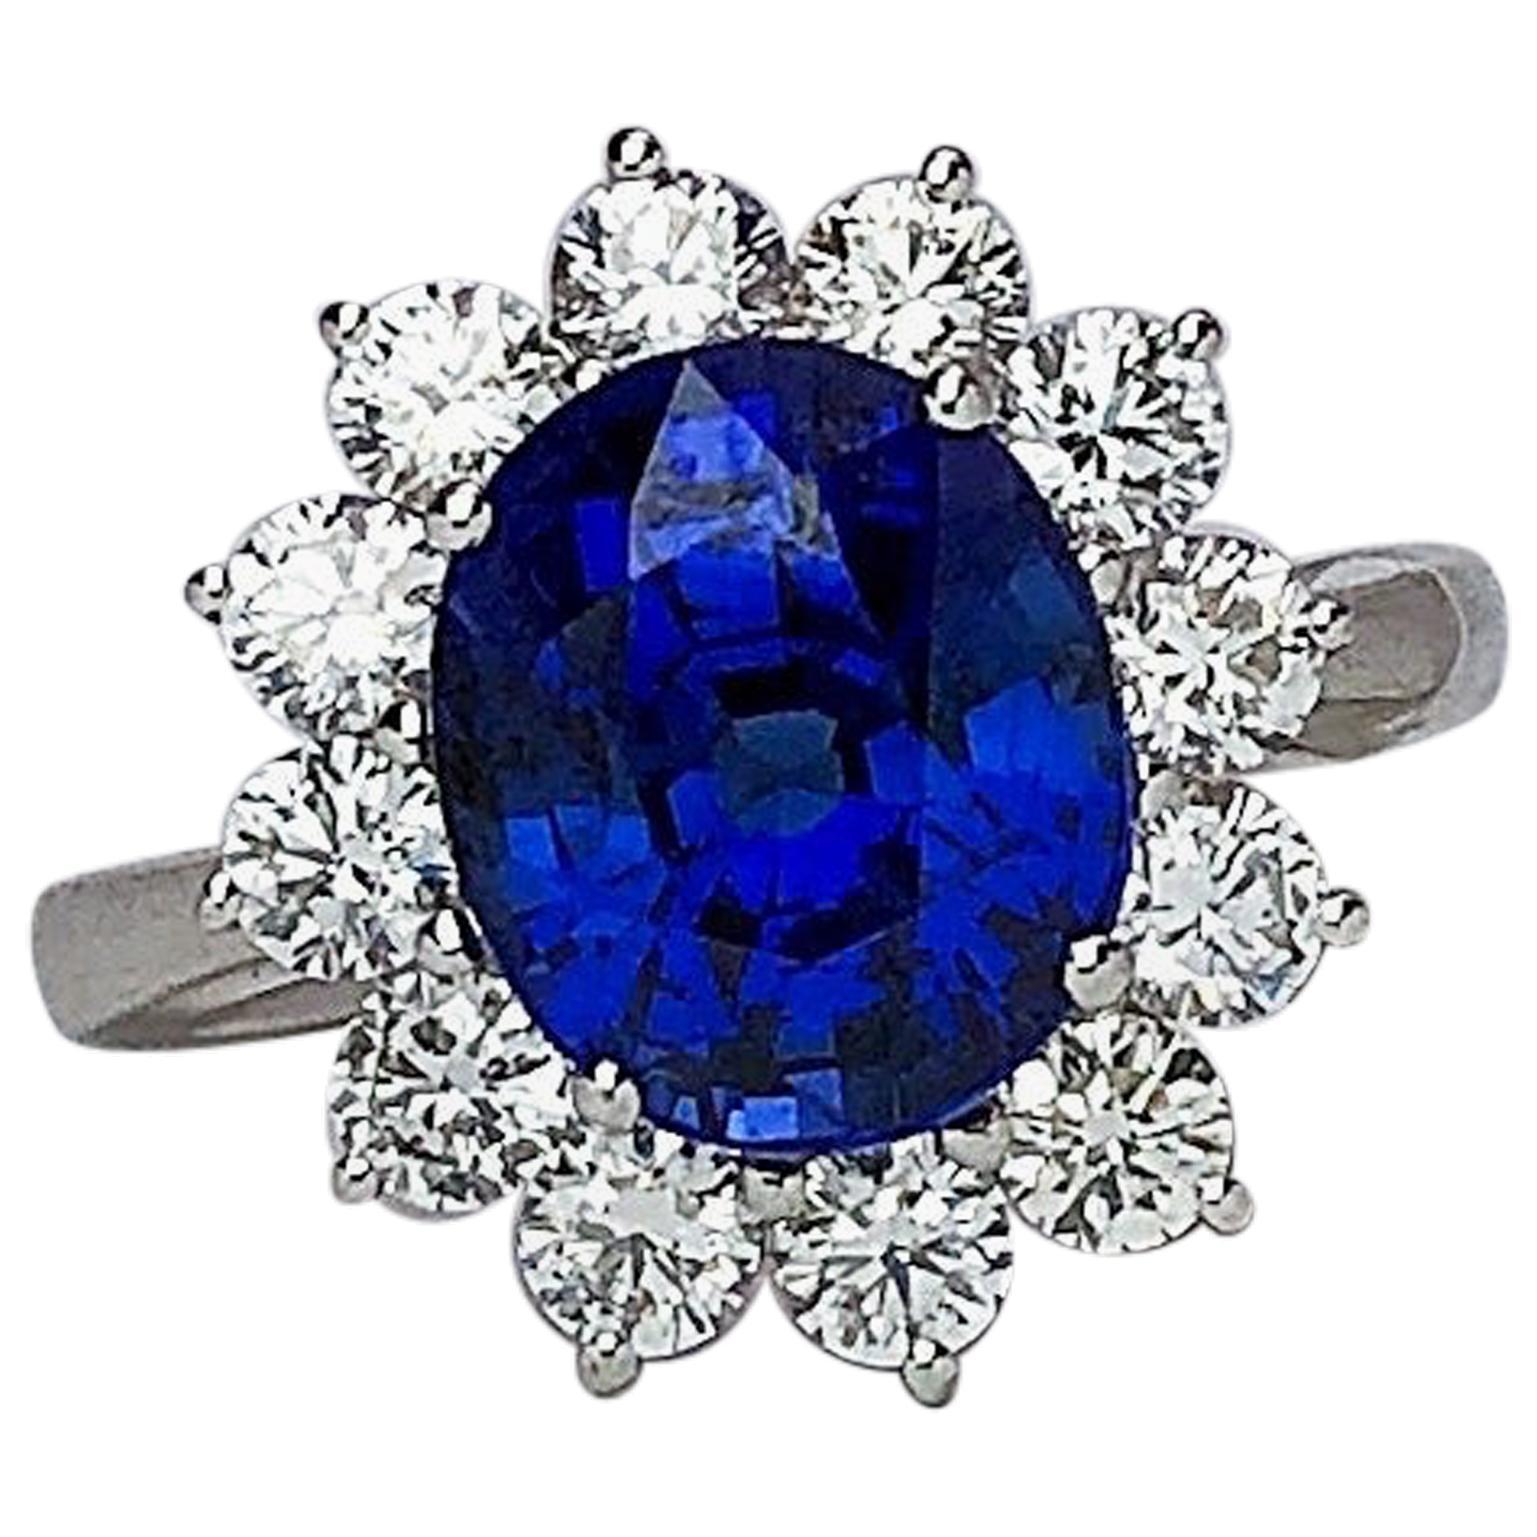 18 Karat Gold Ring with 5.12 Carat Oval Blue Sapphire with 1.27 Carat Diamonds